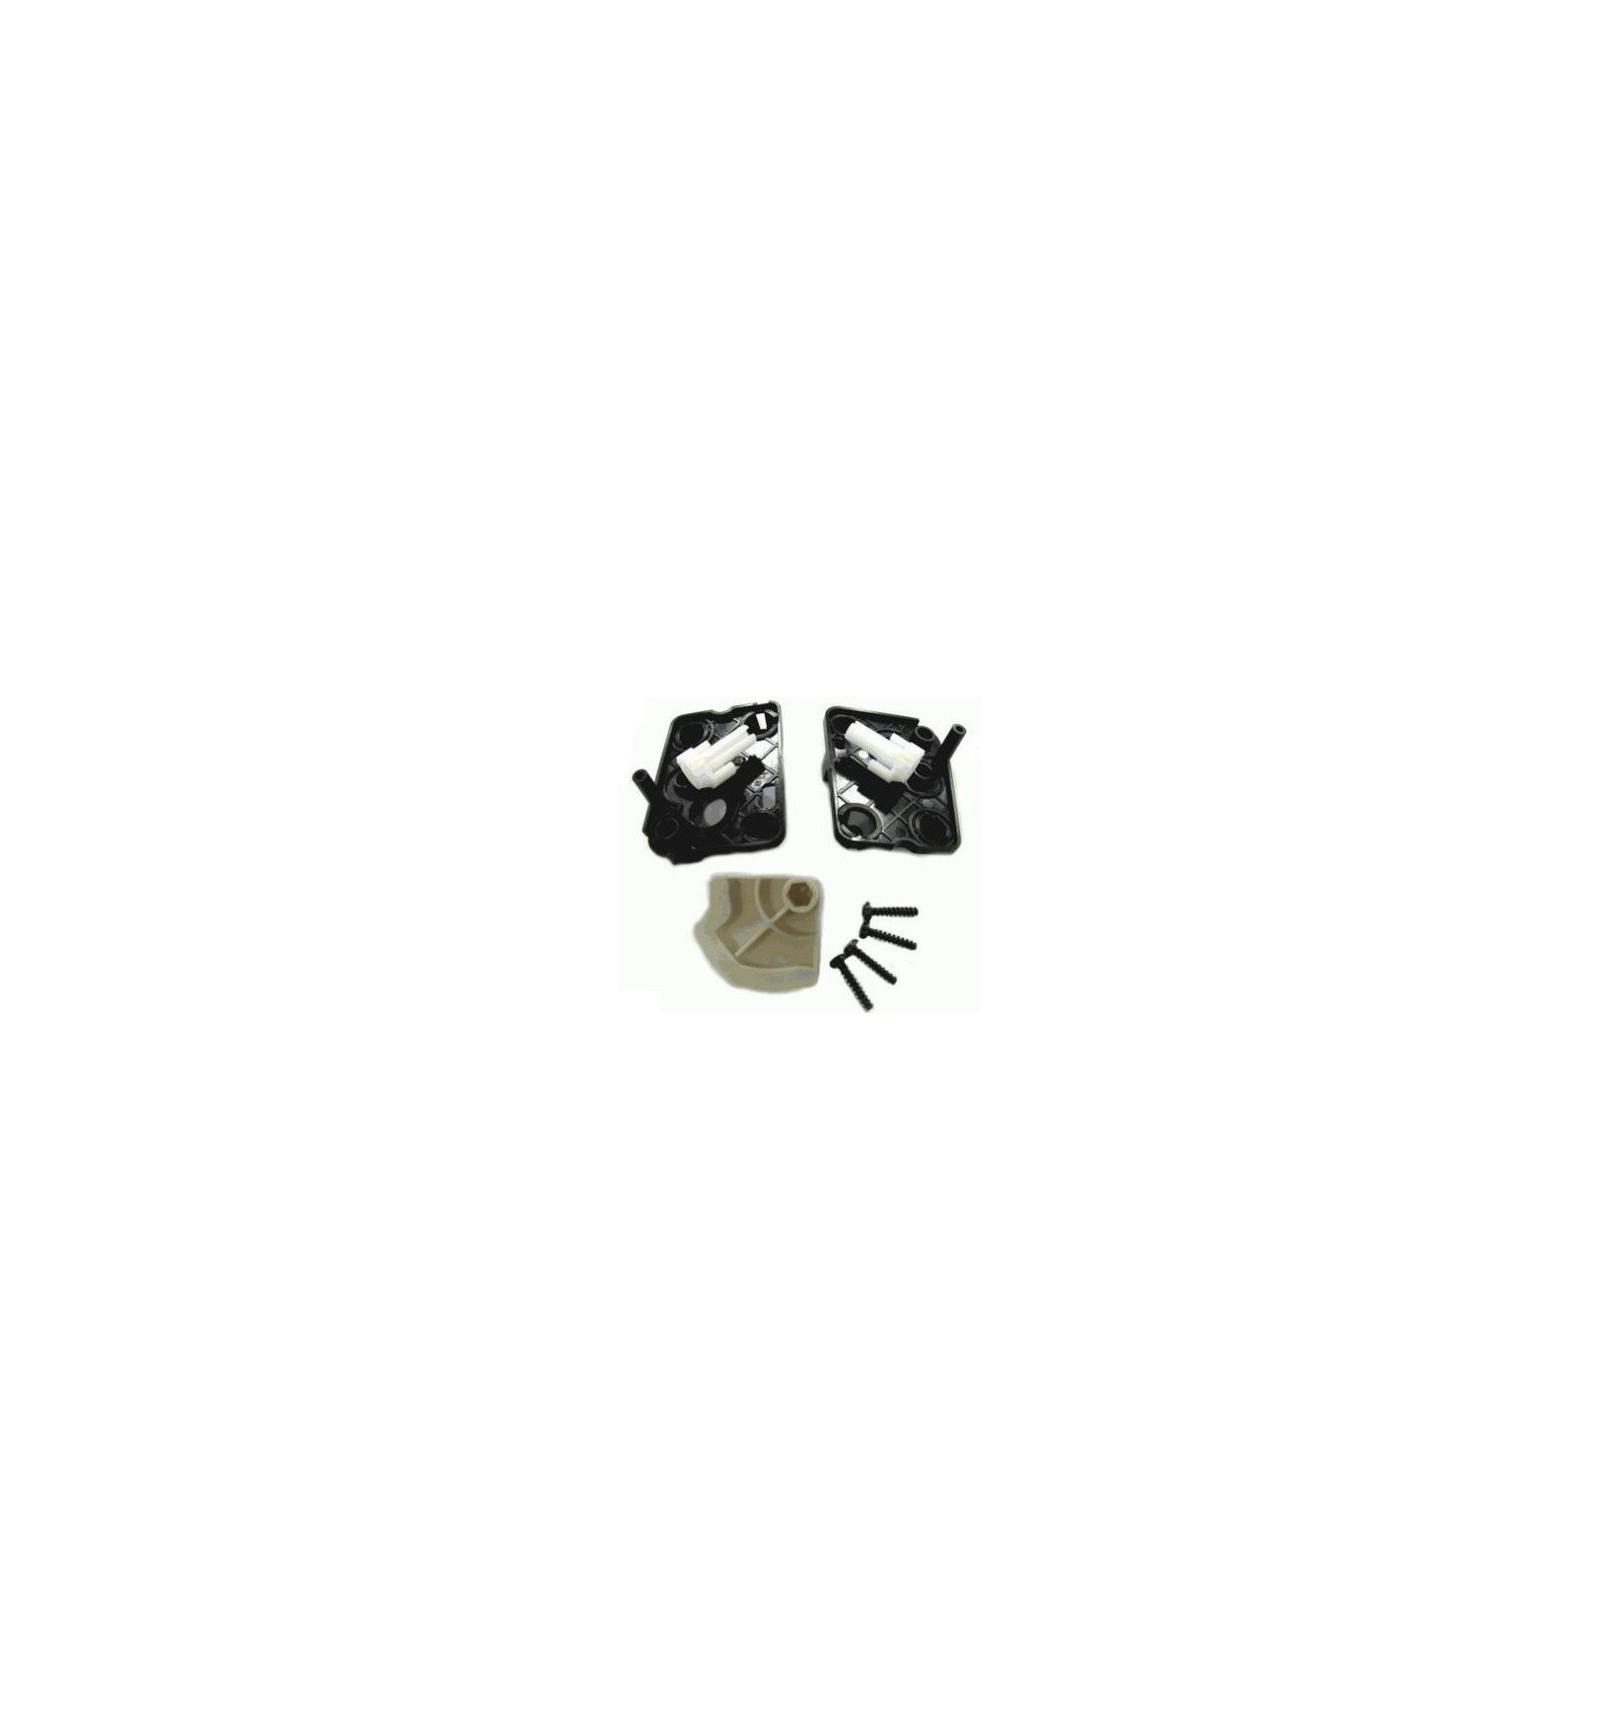 kit reparation engrenage clim bi zone citroen c4 peugeot 307. Black Bedroom Furniture Sets. Home Design Ideas